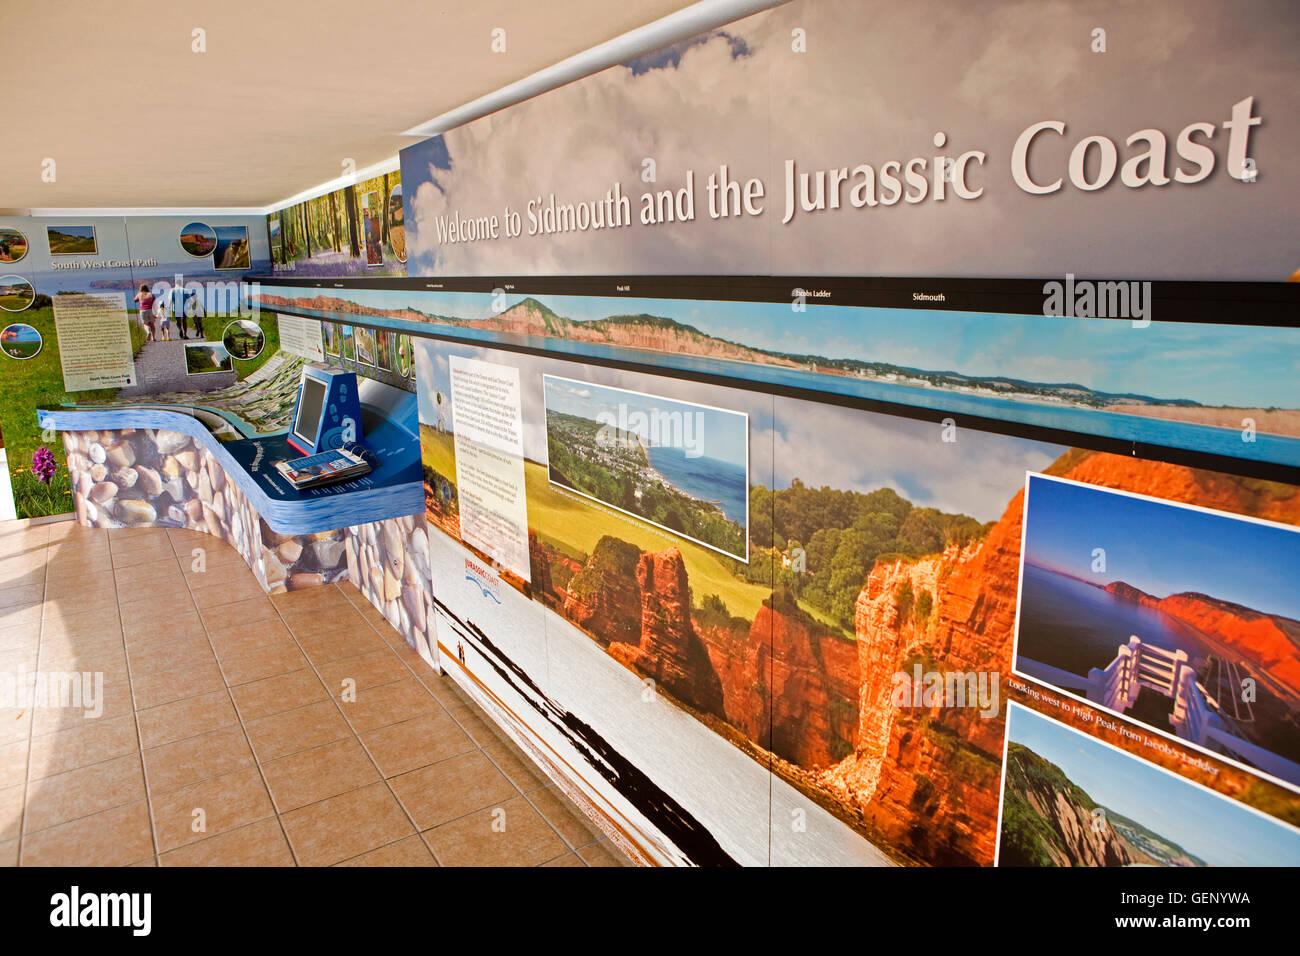 UK, England, Devon, Sidmouth, Peak Hill Road, Jurassic Coast interpretation centre exhibition display - Stock Image